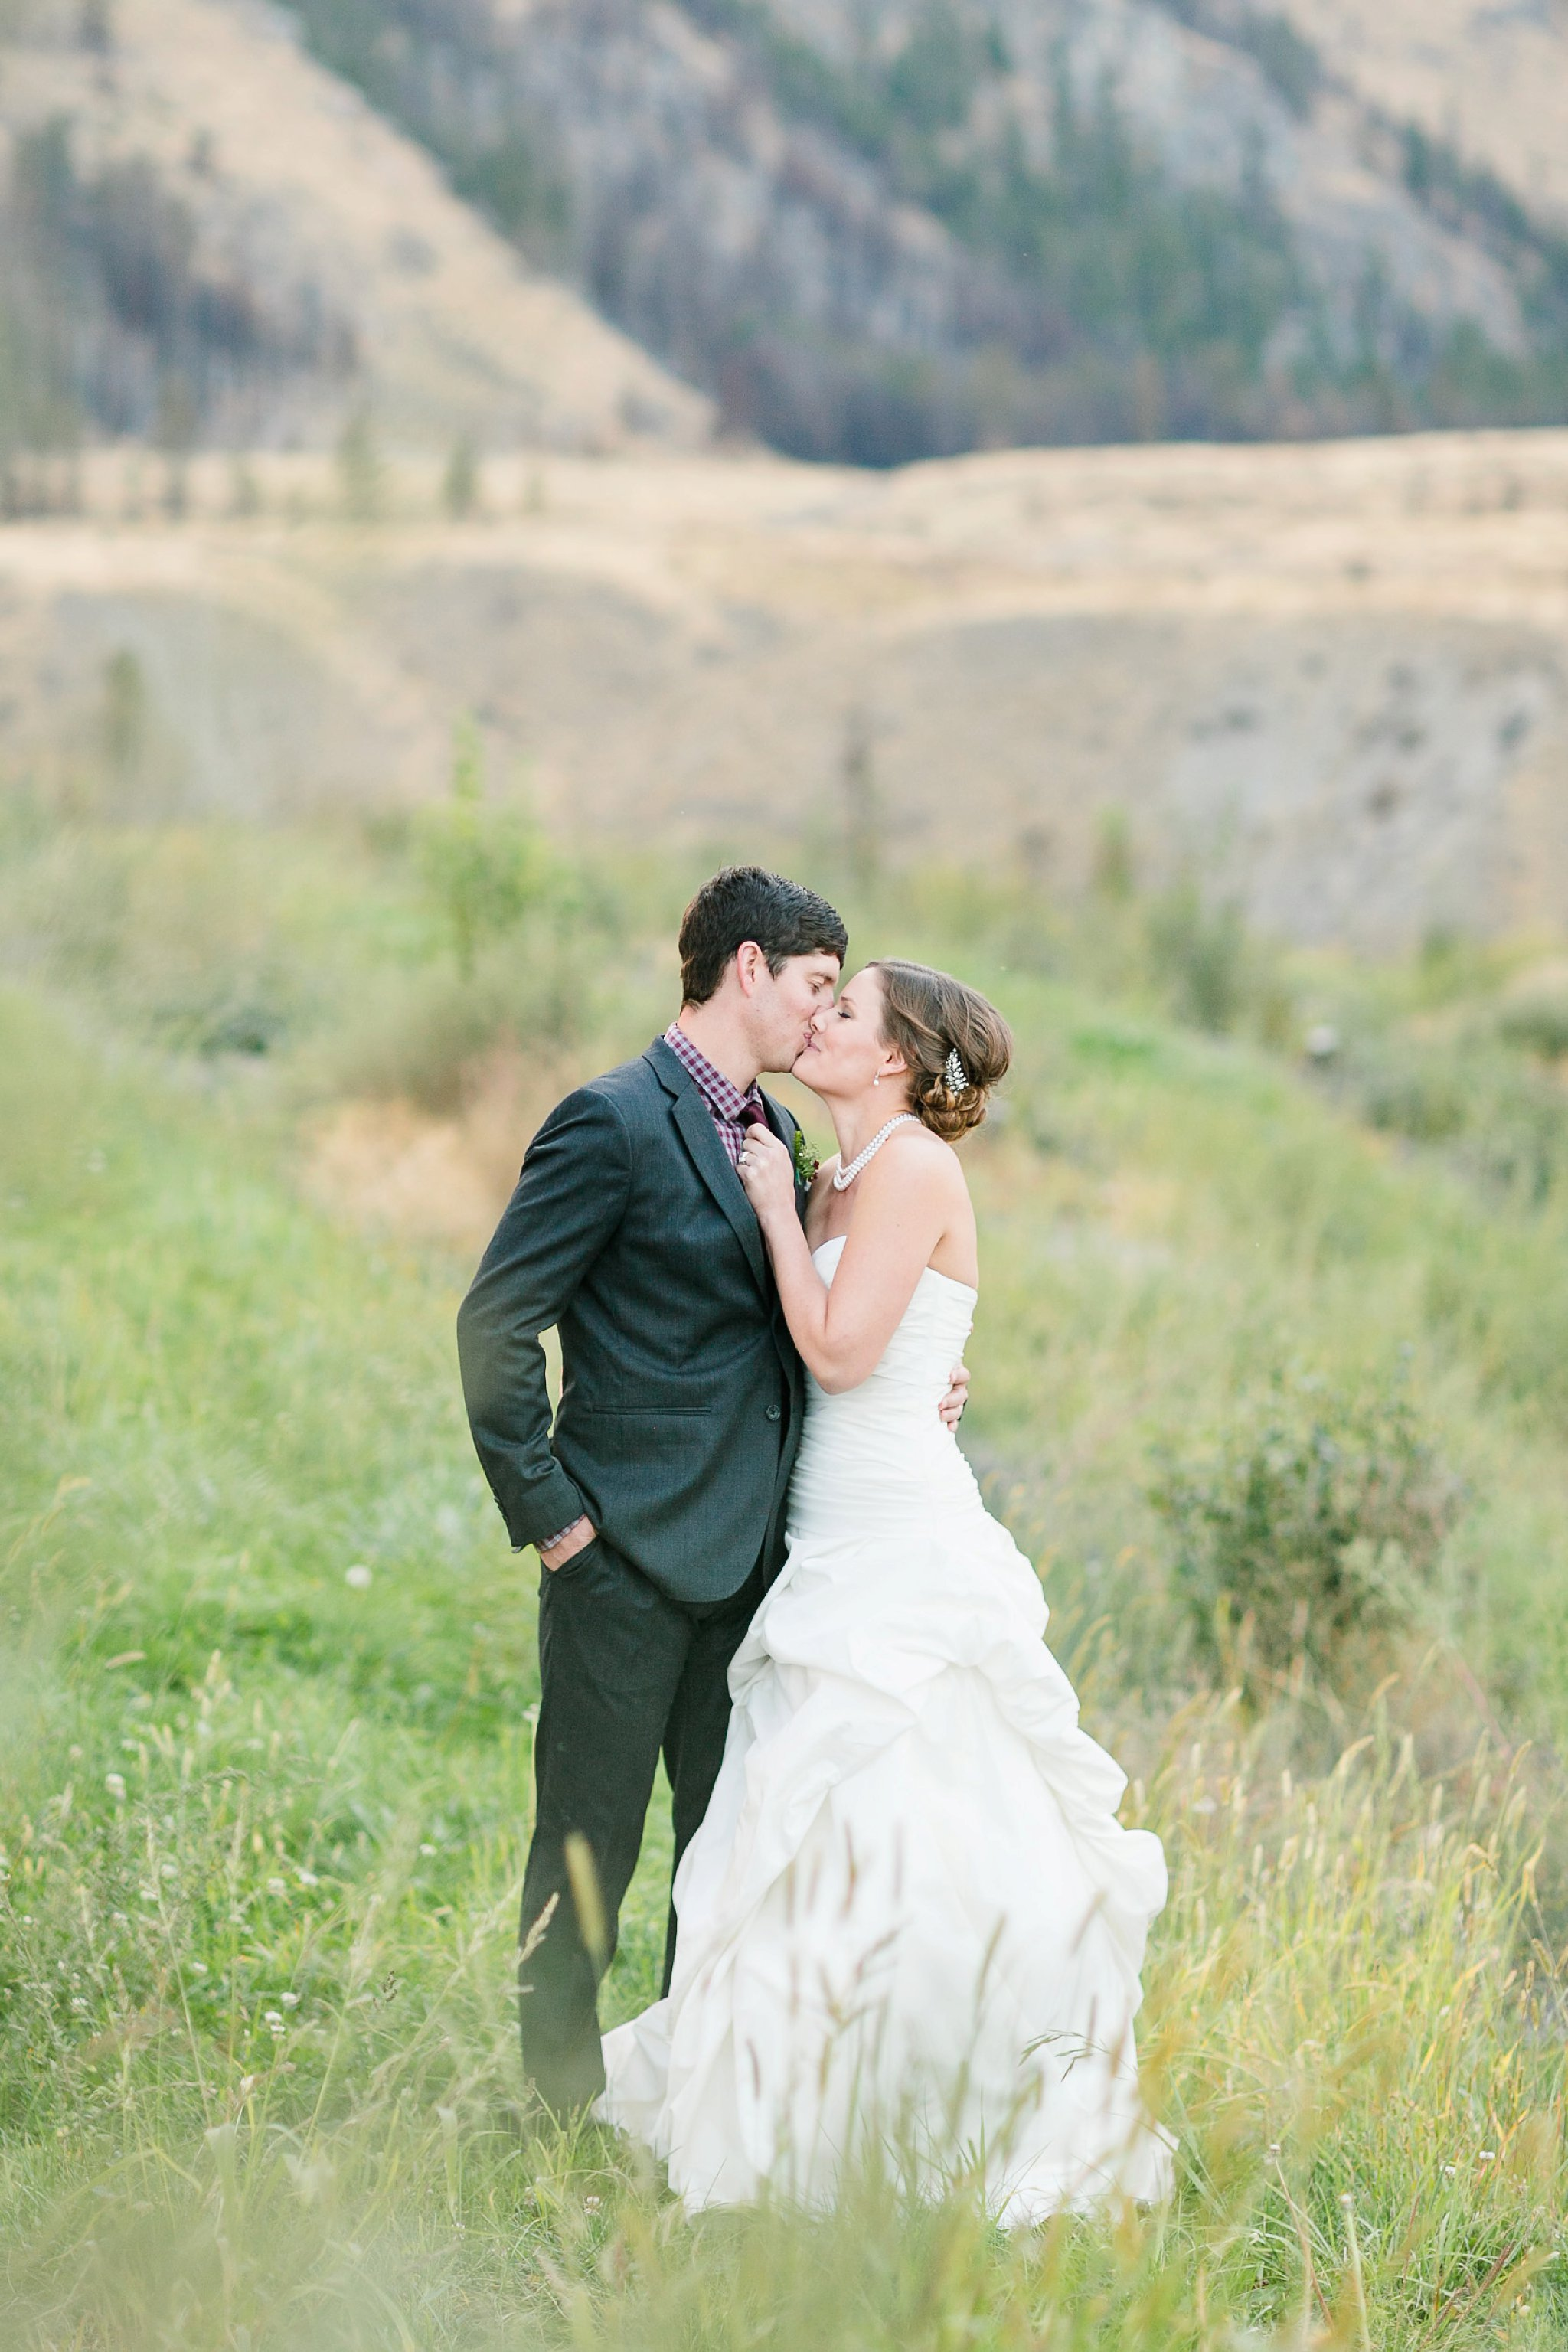 Chelan Washington Wedding Photos Megan Kelsey Photography Delight Wedding Workshop Styled Shoot Annalee & Scot-248.jpg